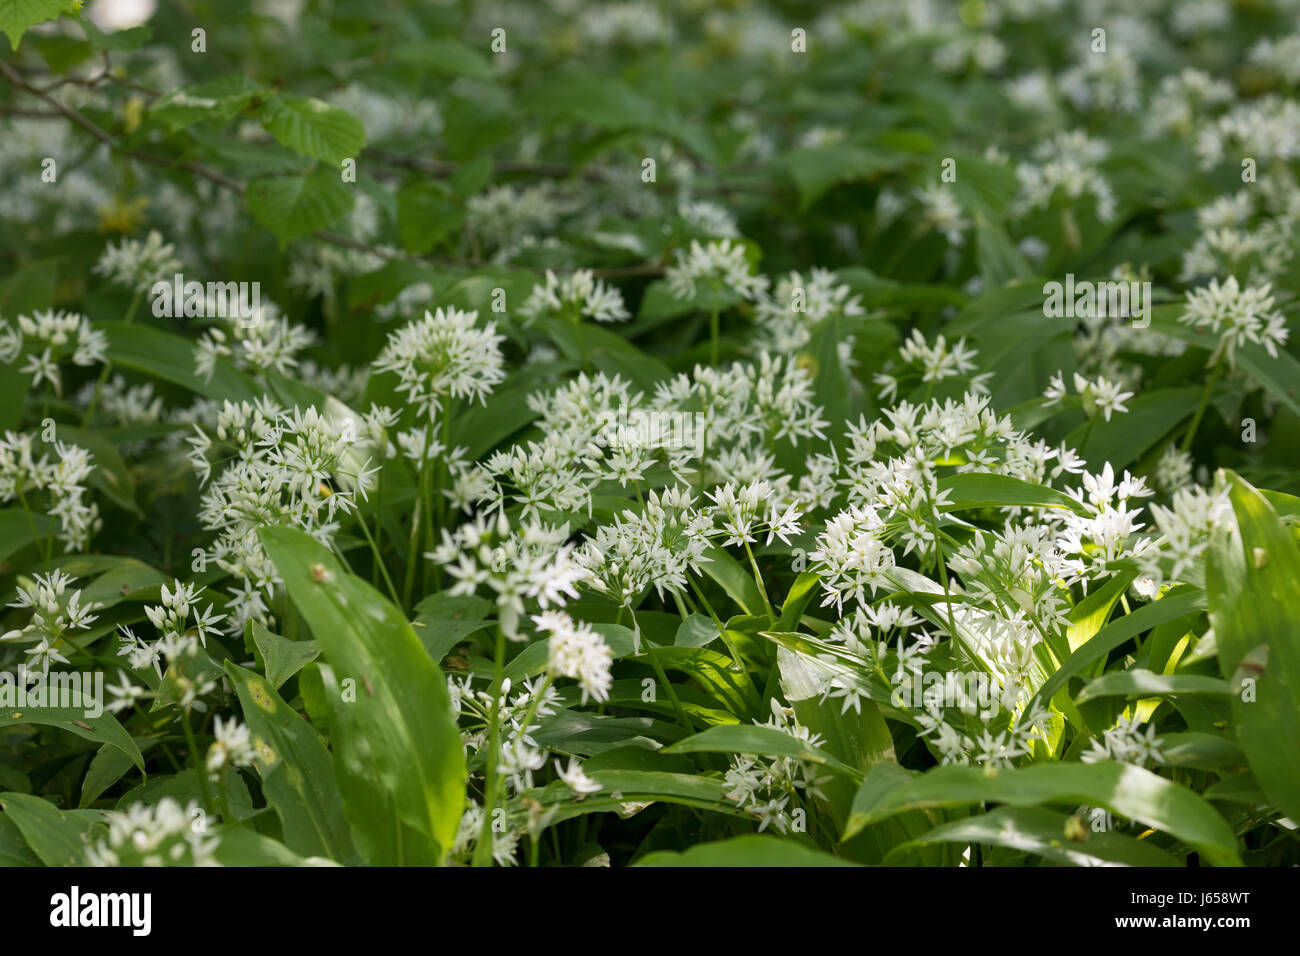 Bärlauch, Bär-Lauch Bärlauchbestand, Bestand, Allium ursinum, Ramsons, bois, l'Ail, Wood-Garlic, Photo Stock